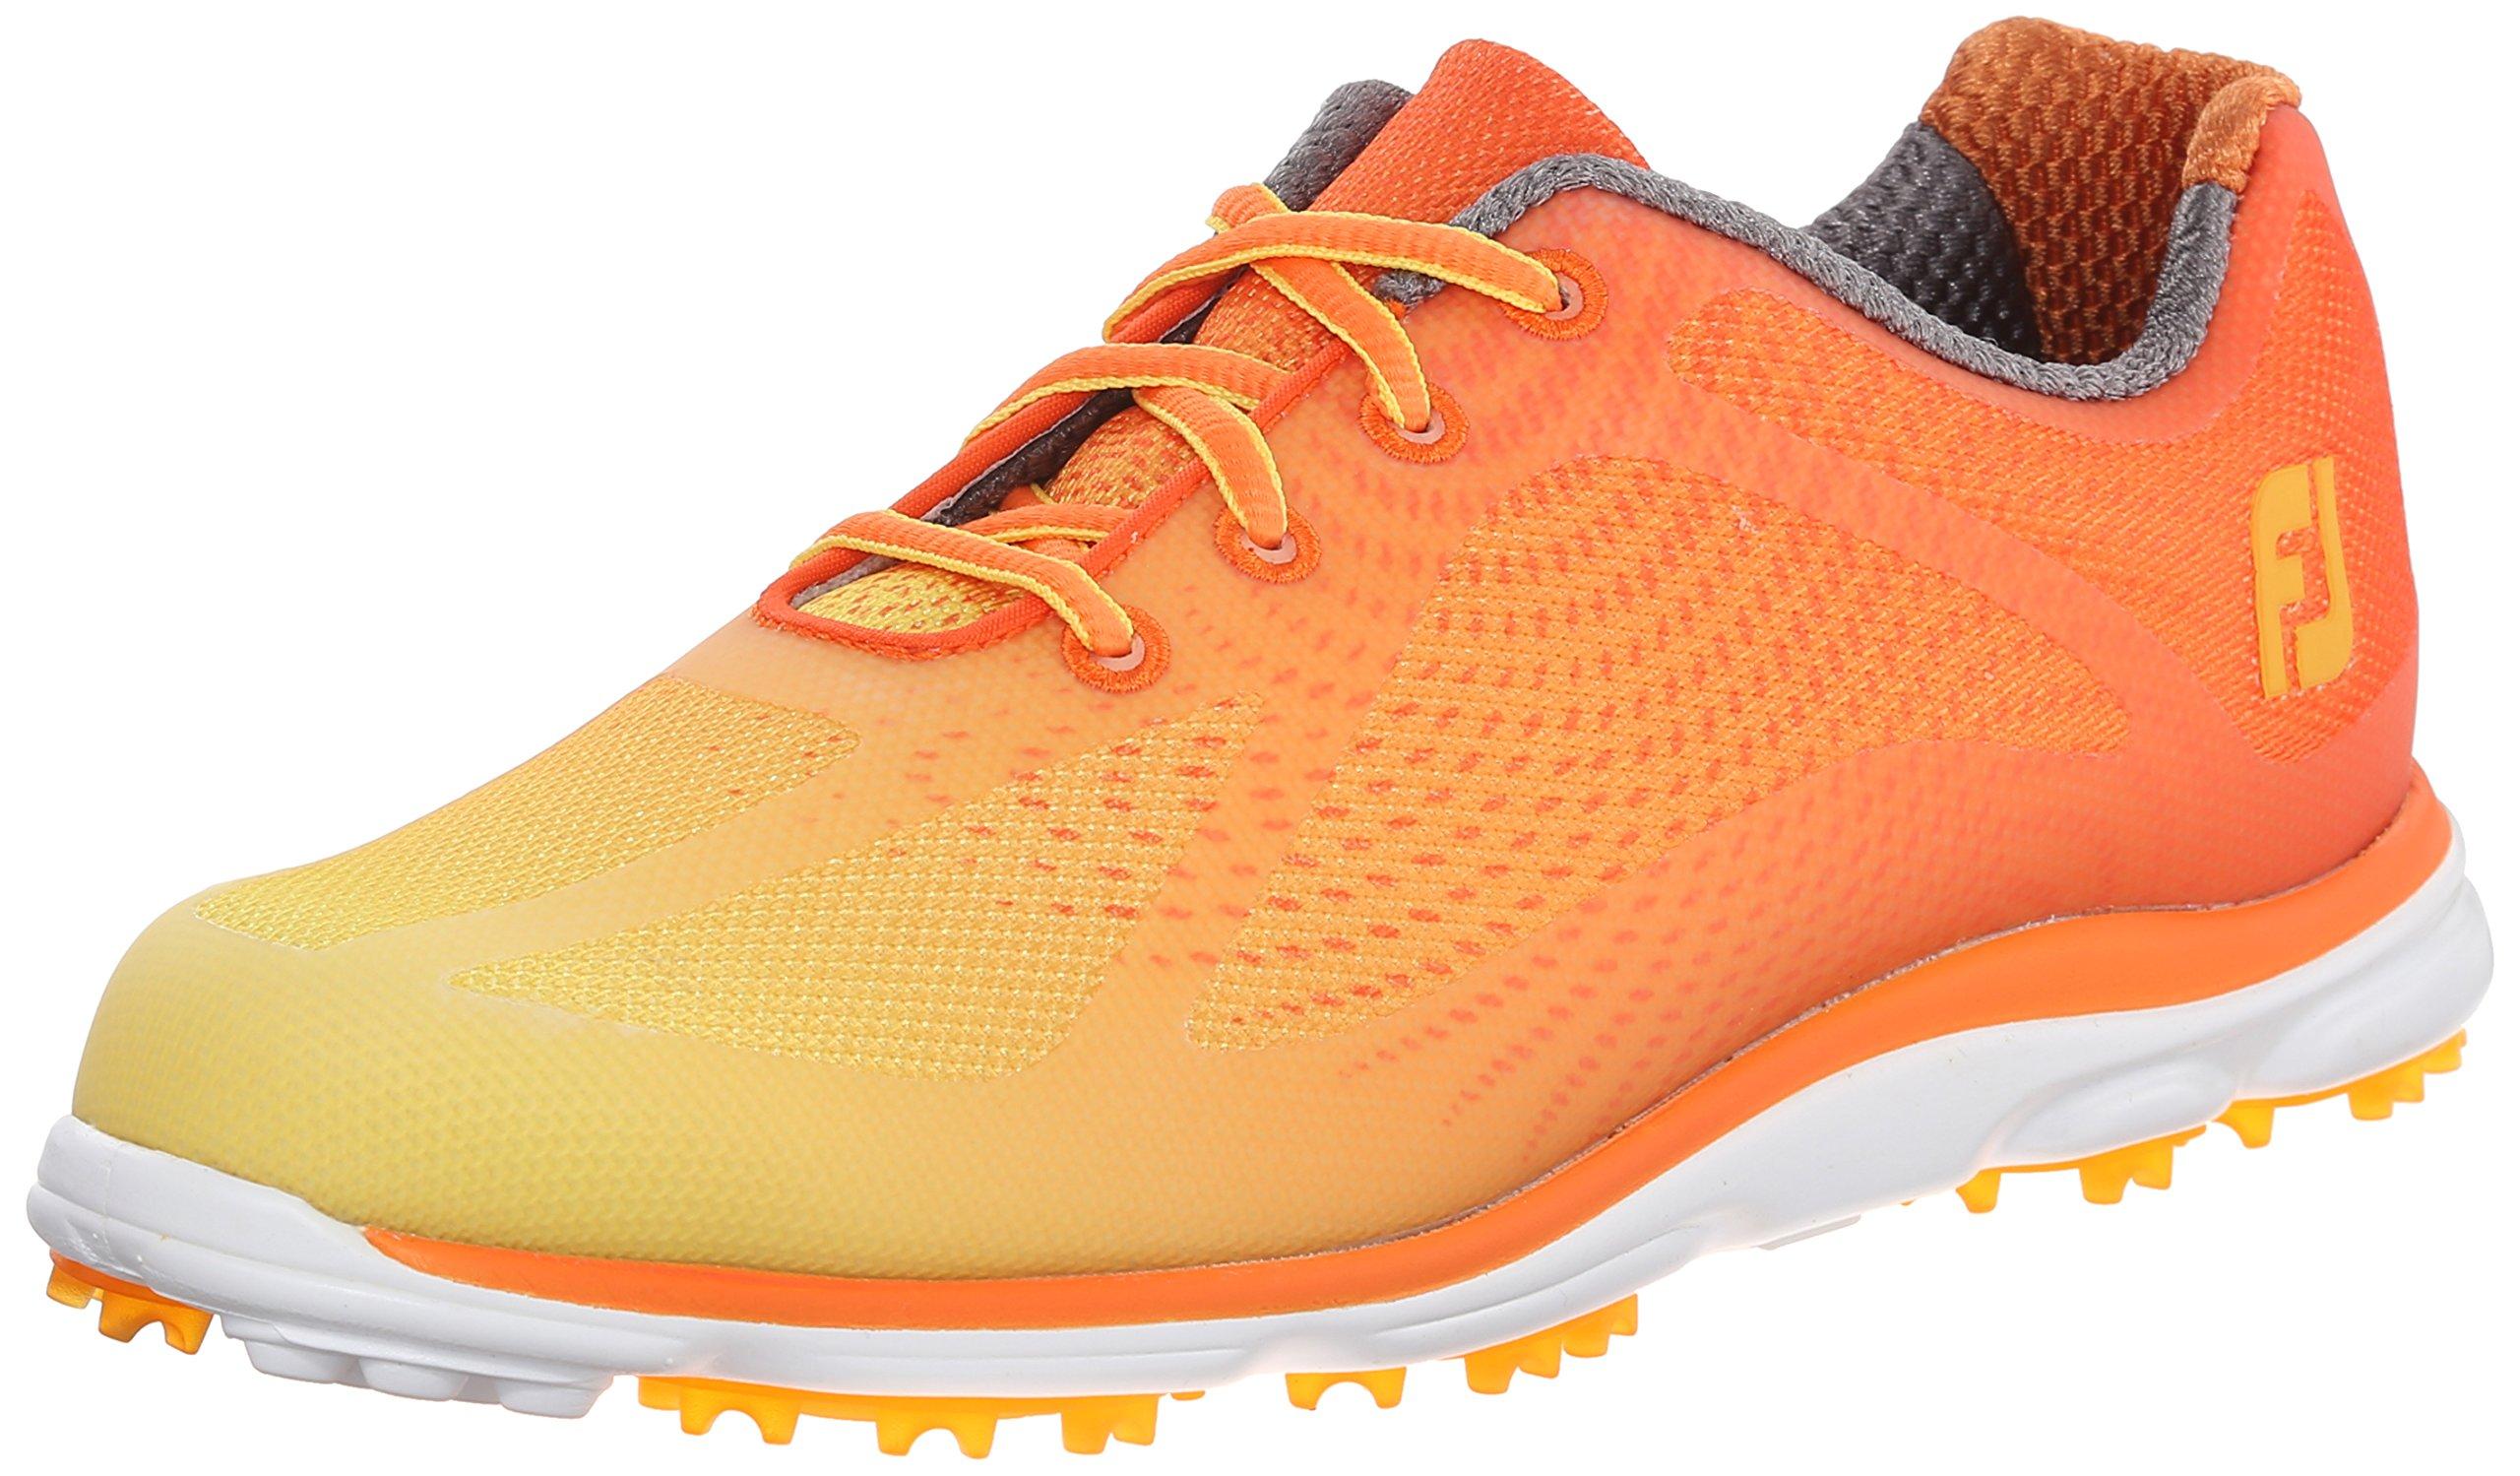 FootJoy EmPower Spikeless Golf Shoes CLOSEOUT 2015 Women Orange/Yellow Medium 6